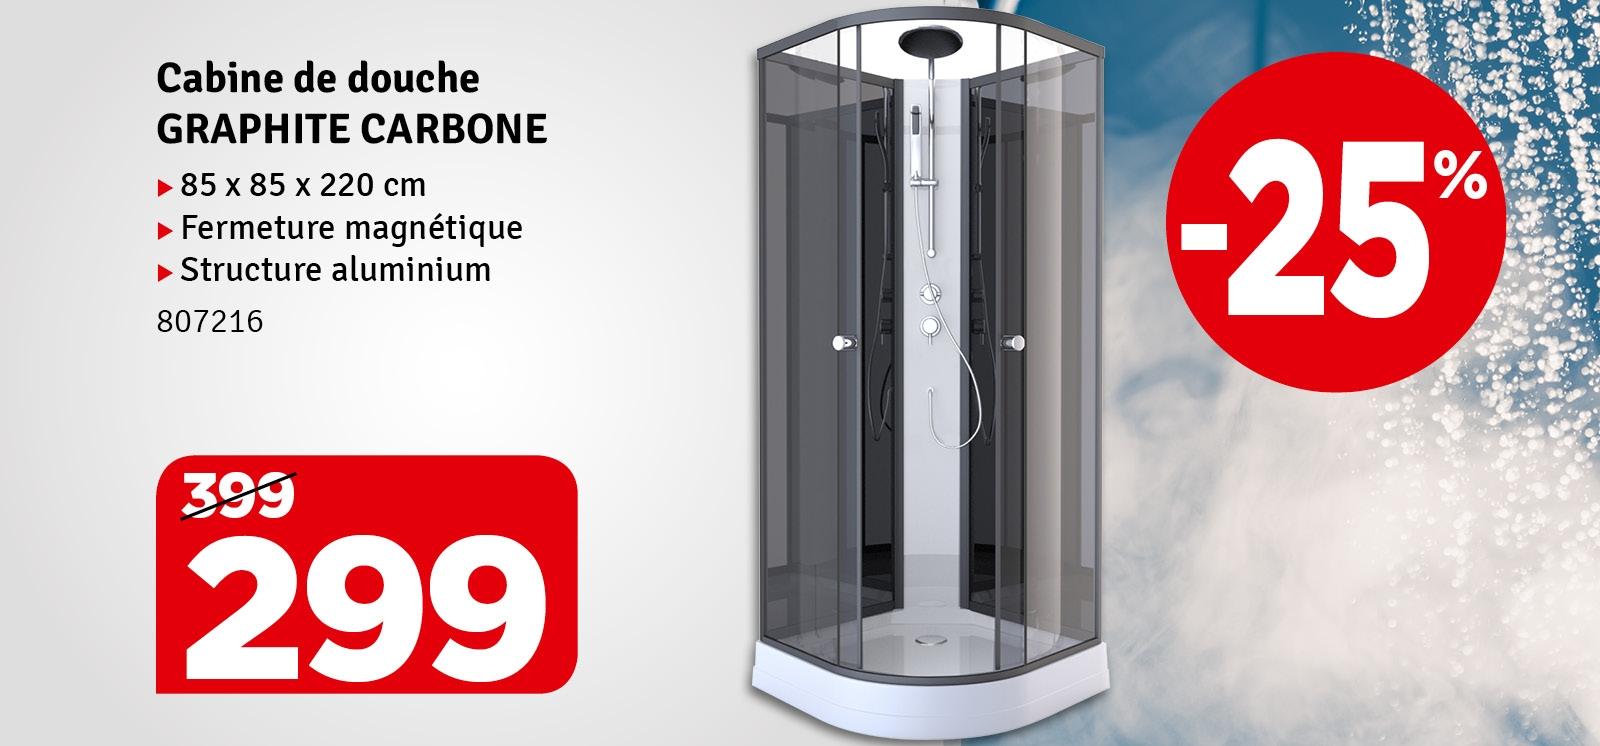 Promo - Cabine de douche Graphite Carbone 85 x 85 x 225 cm AURLANE